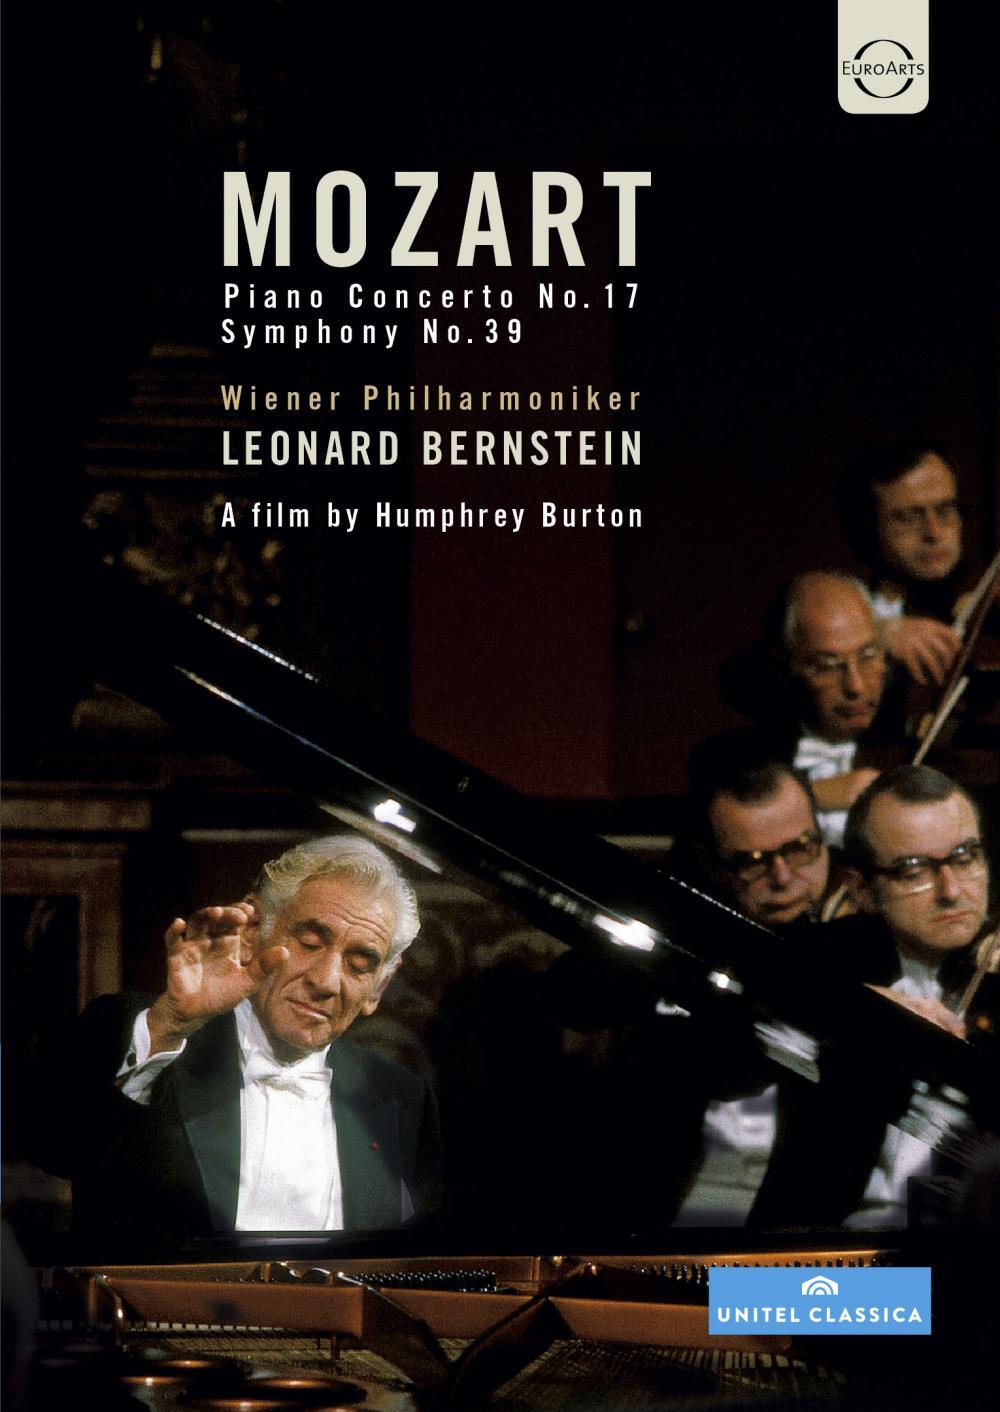 classical music dts 5.1 torrent